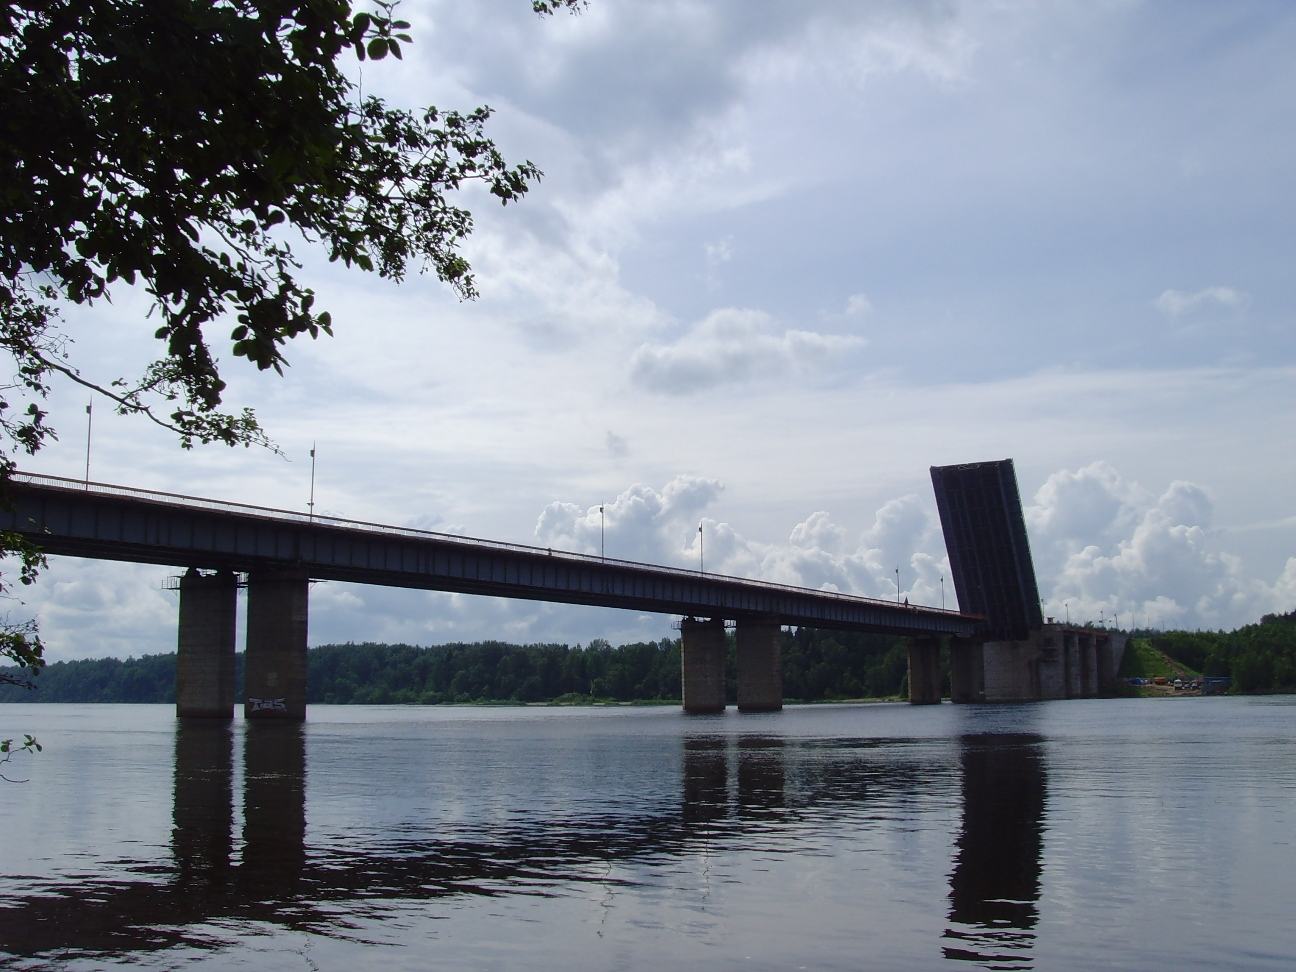 Ладожский мост на трассе Р-21 «Кола» разведут 10 июня